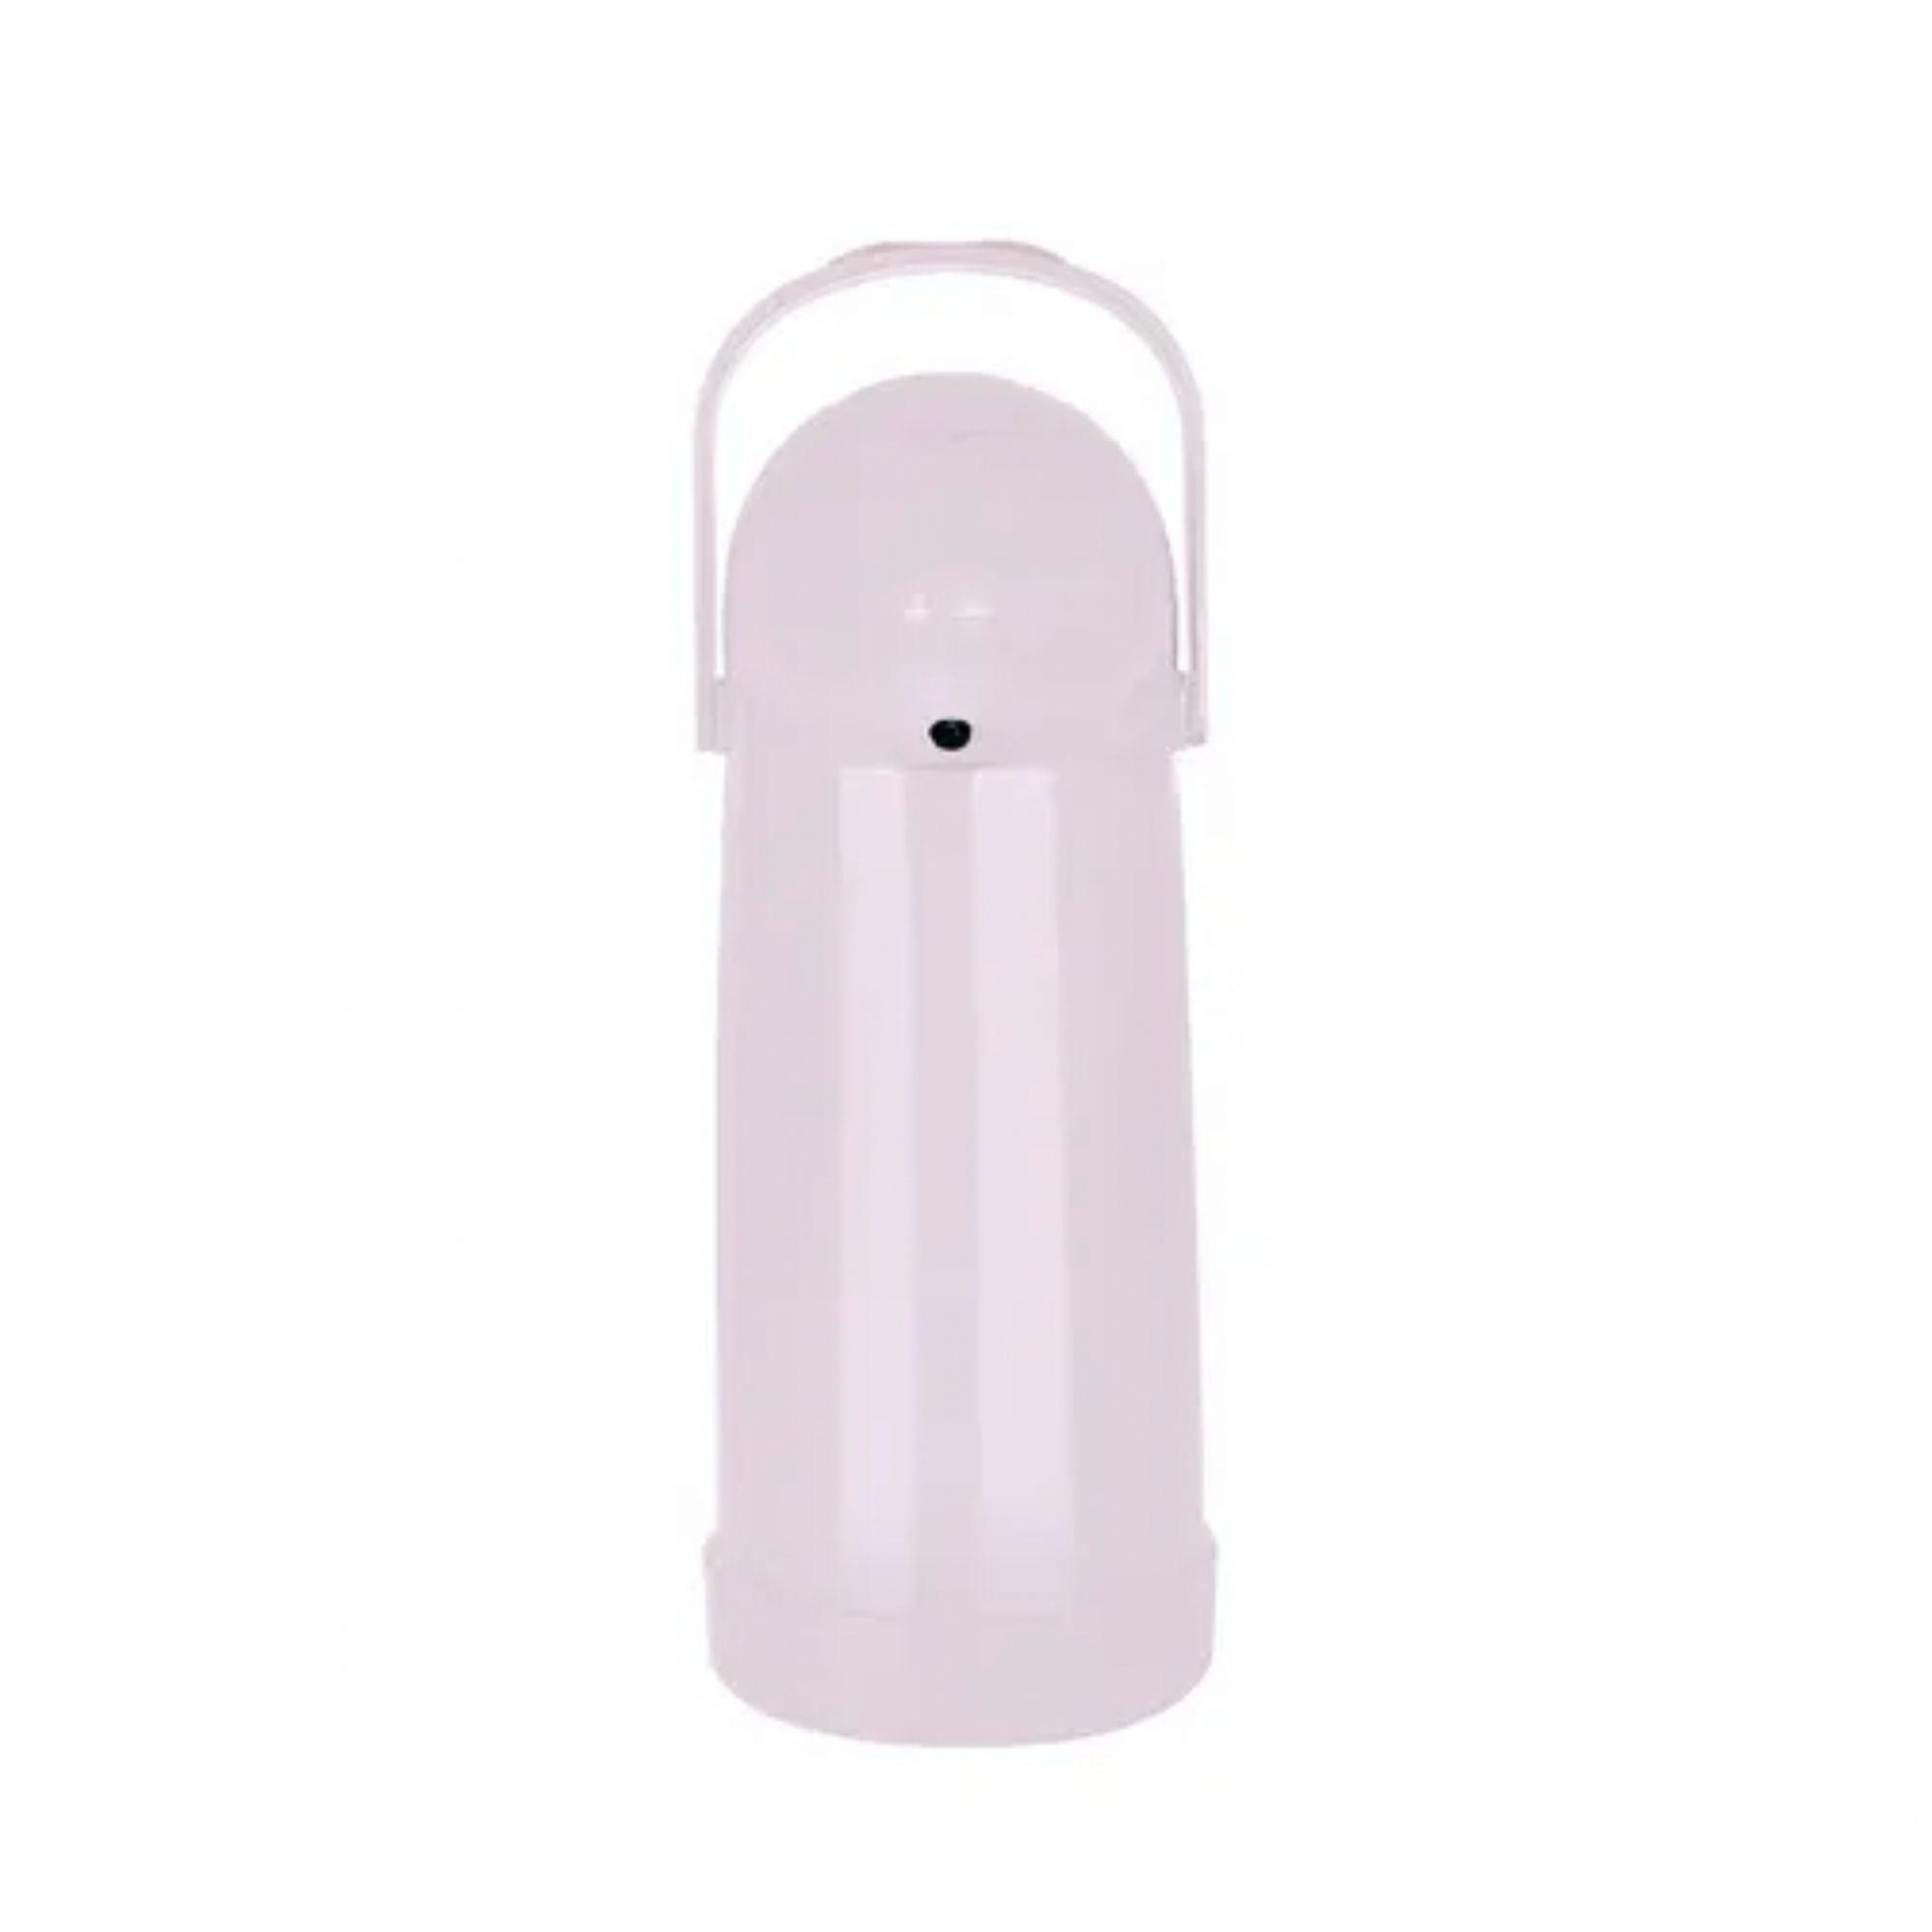 Garrafa Térmica de Pressão Nobile 1 Litro Lavanda - Mor  - Pensou Filtros